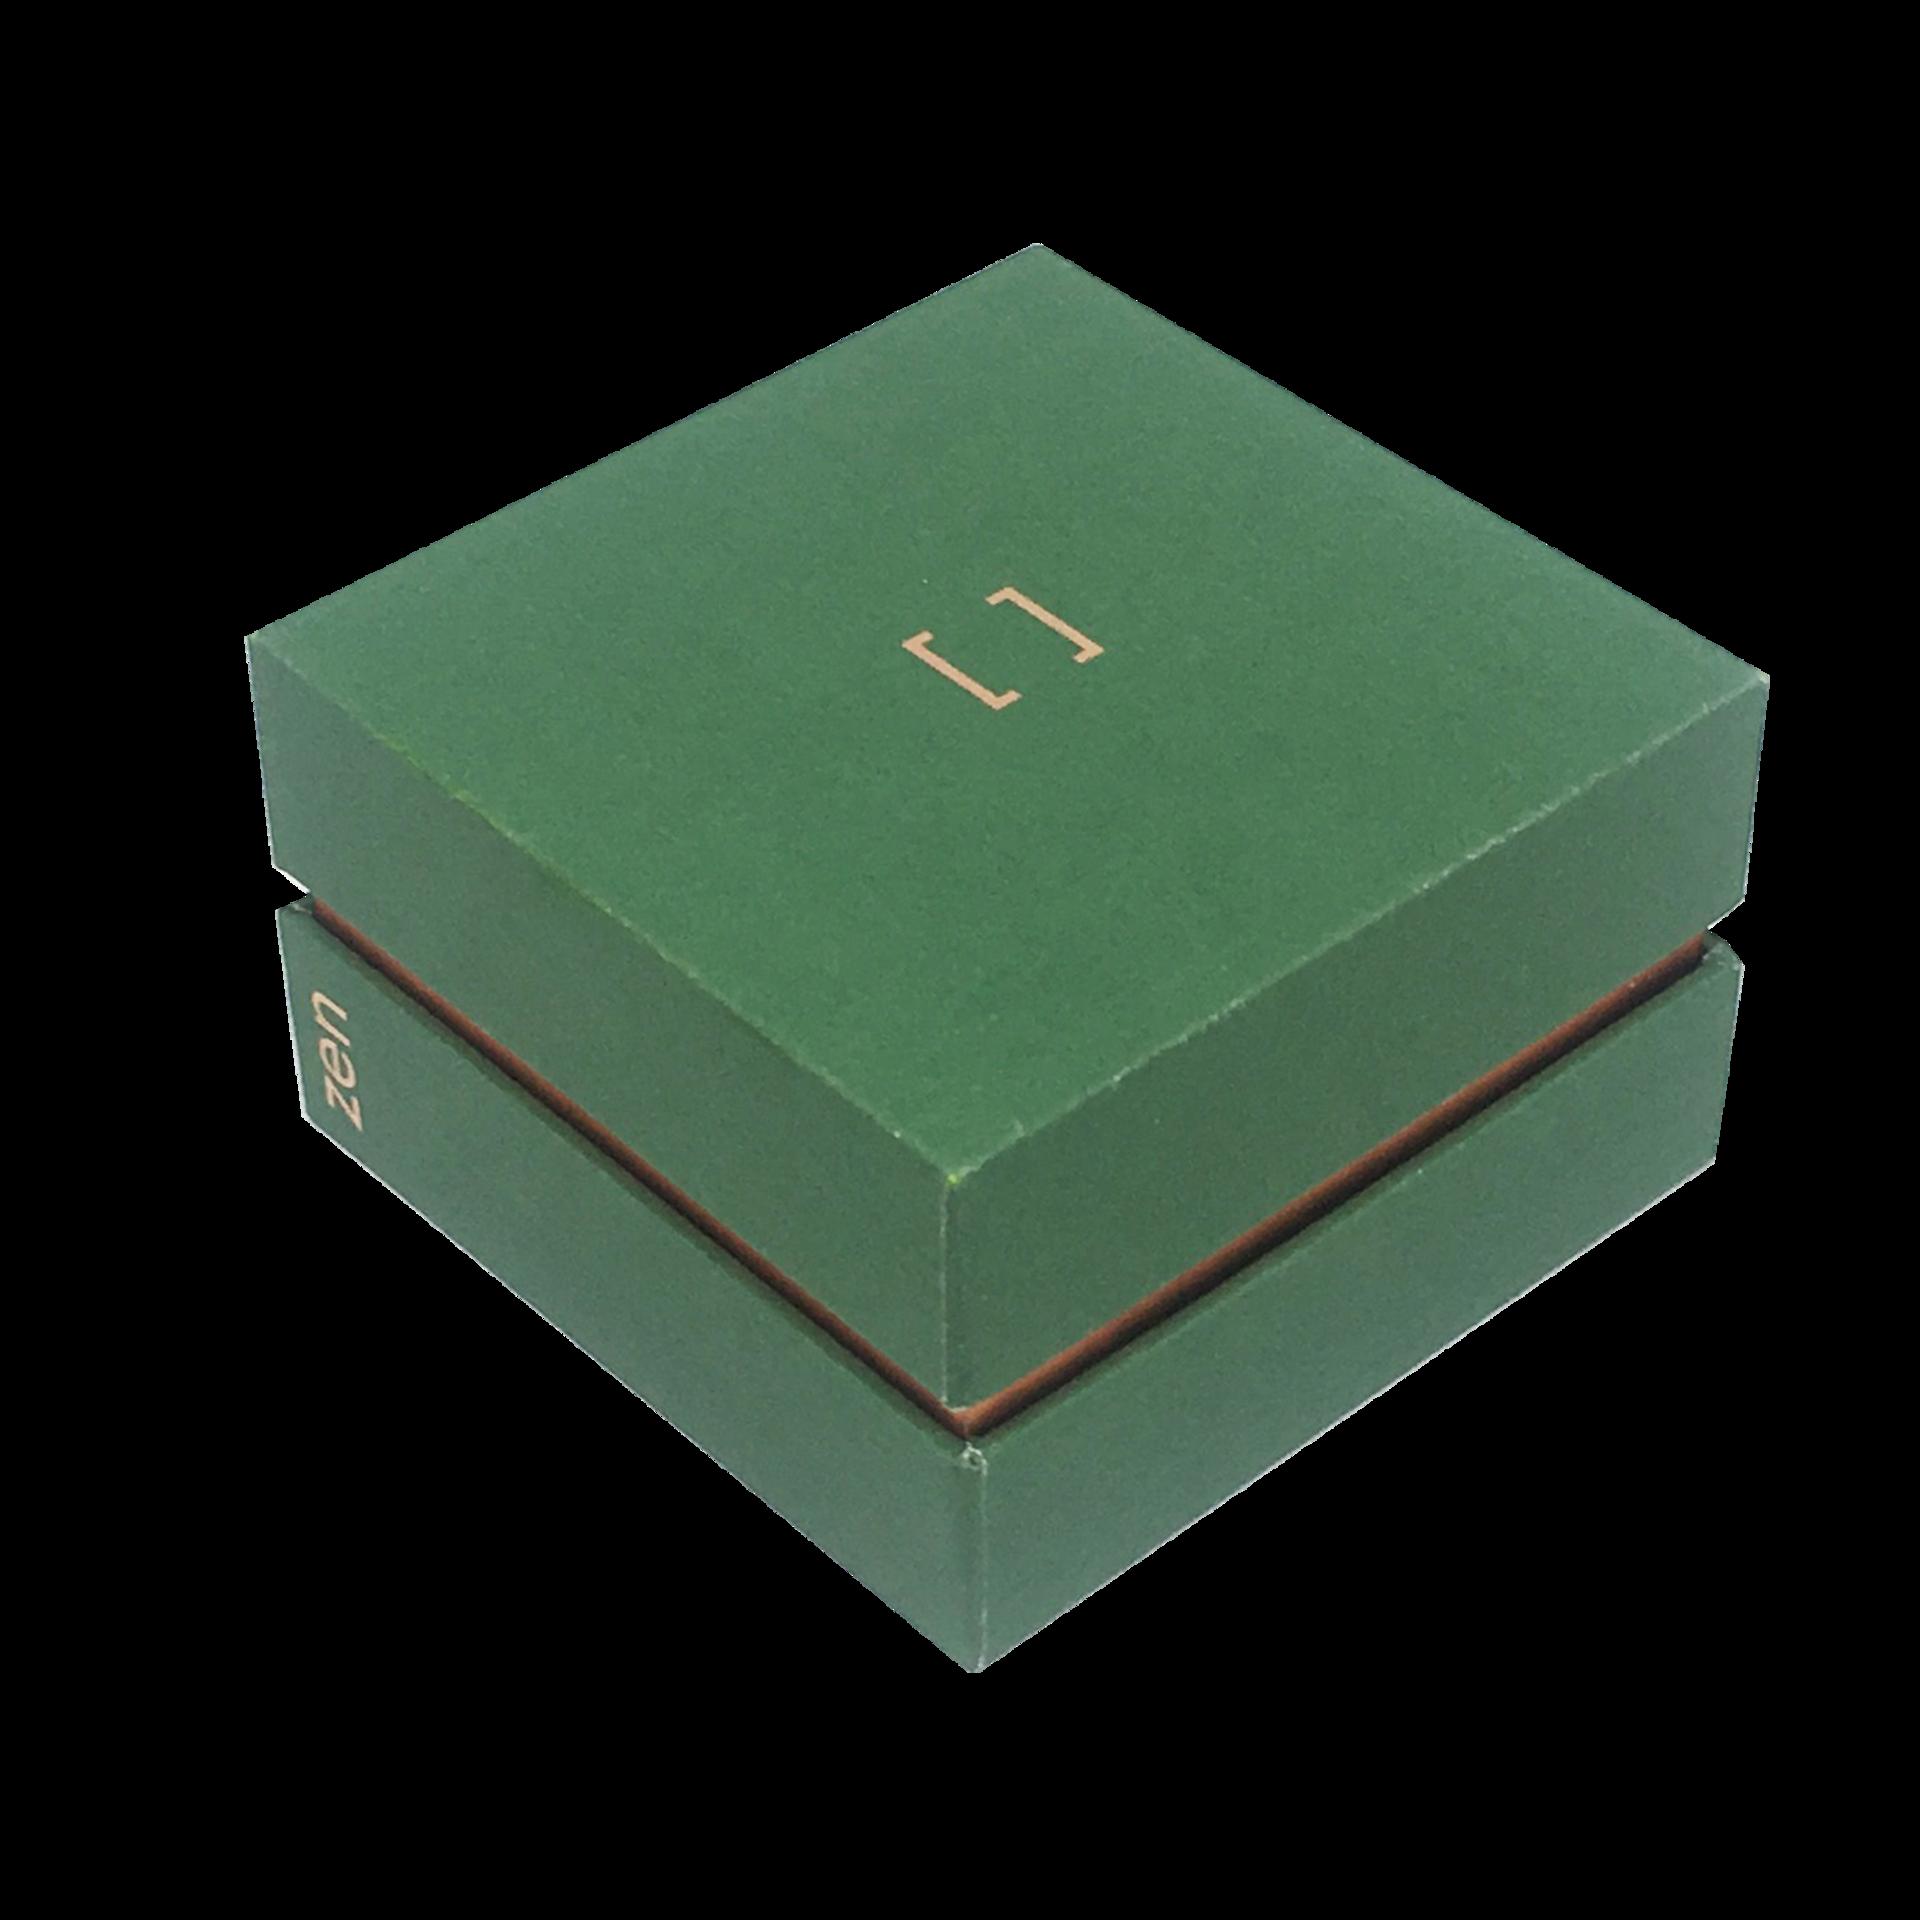 Phone Case Pen Gift Cardboard Luxury Shoe Necktie Lashes Large Drawer Custom Packaging Retail Paper Box Gold Hot Stamping